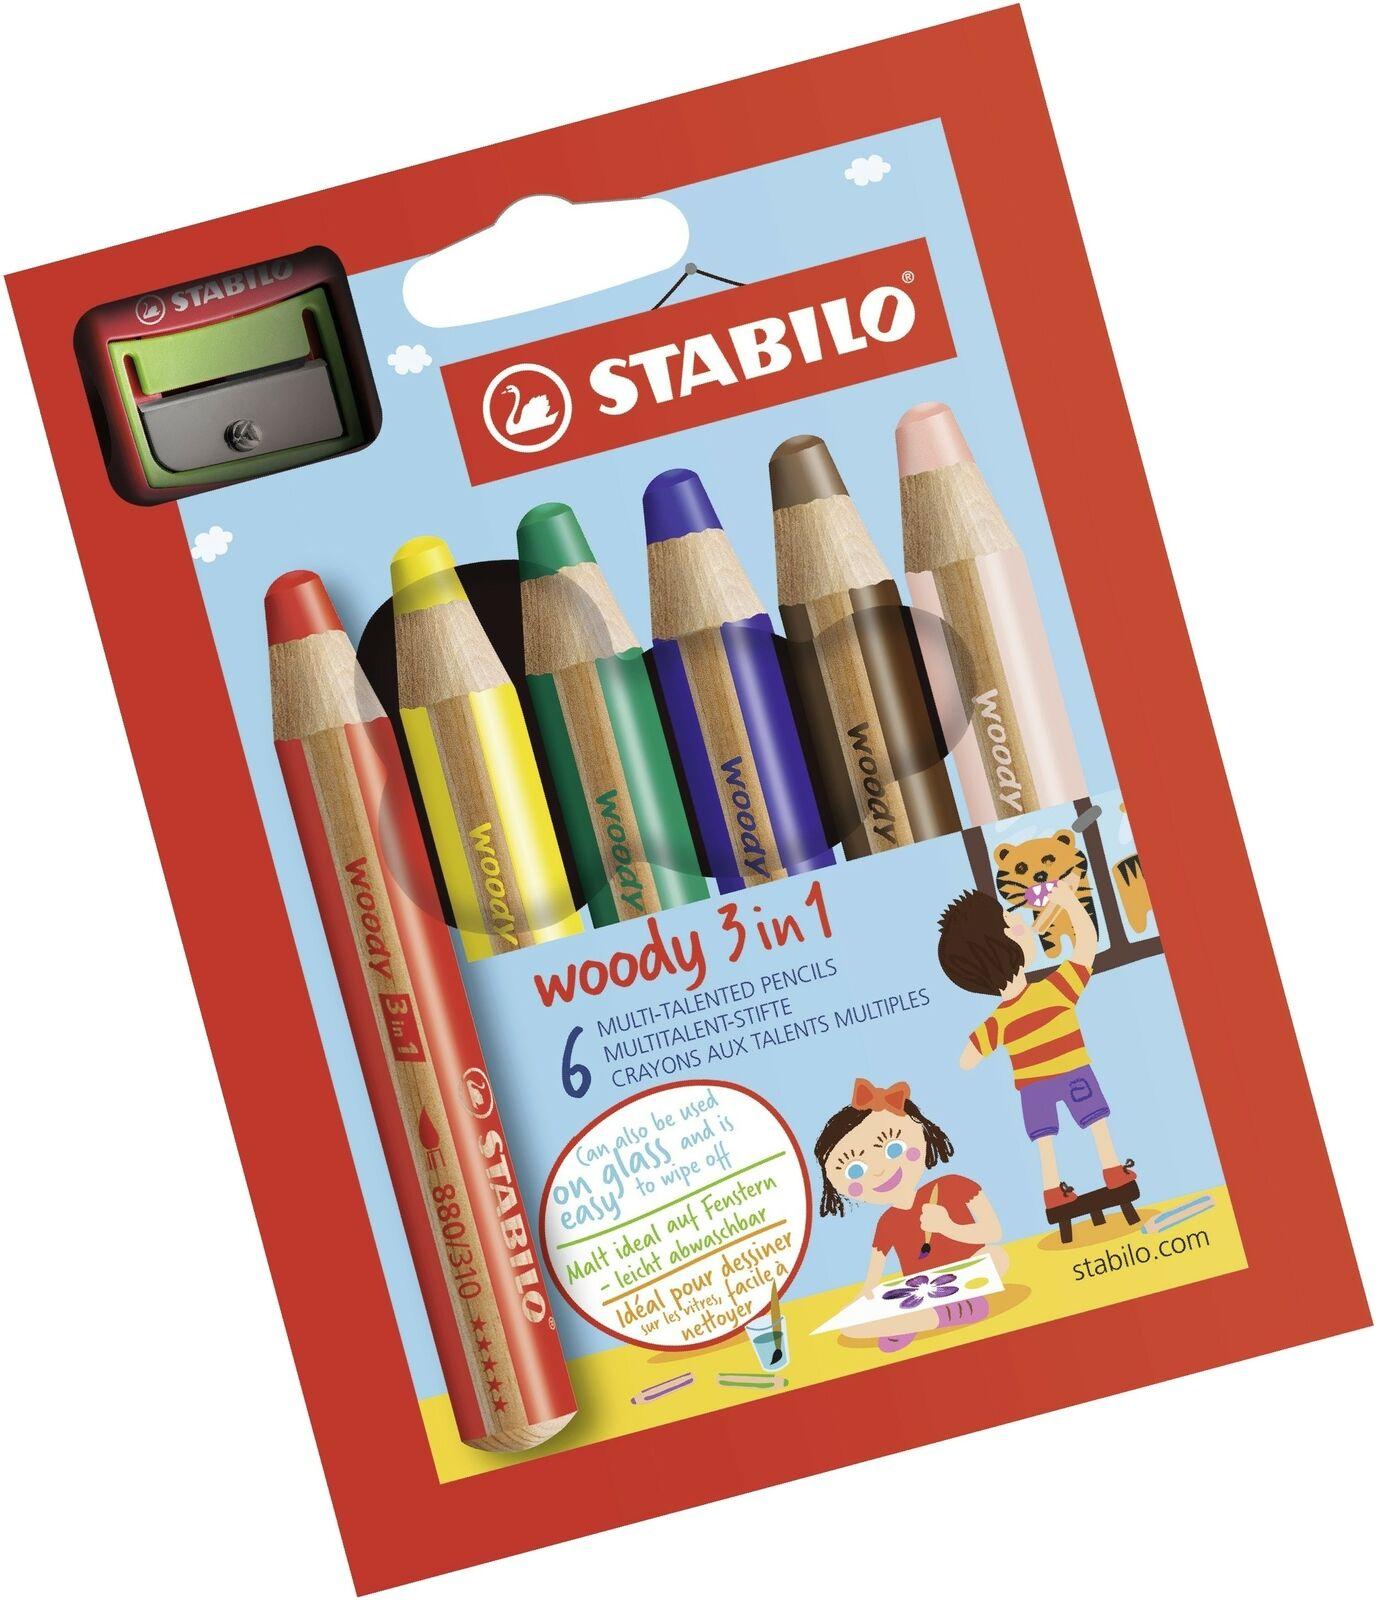 Woody 3 in 1-18 Jumbo Easy-Grip Watercolour Pencils with Sharpener STABILO